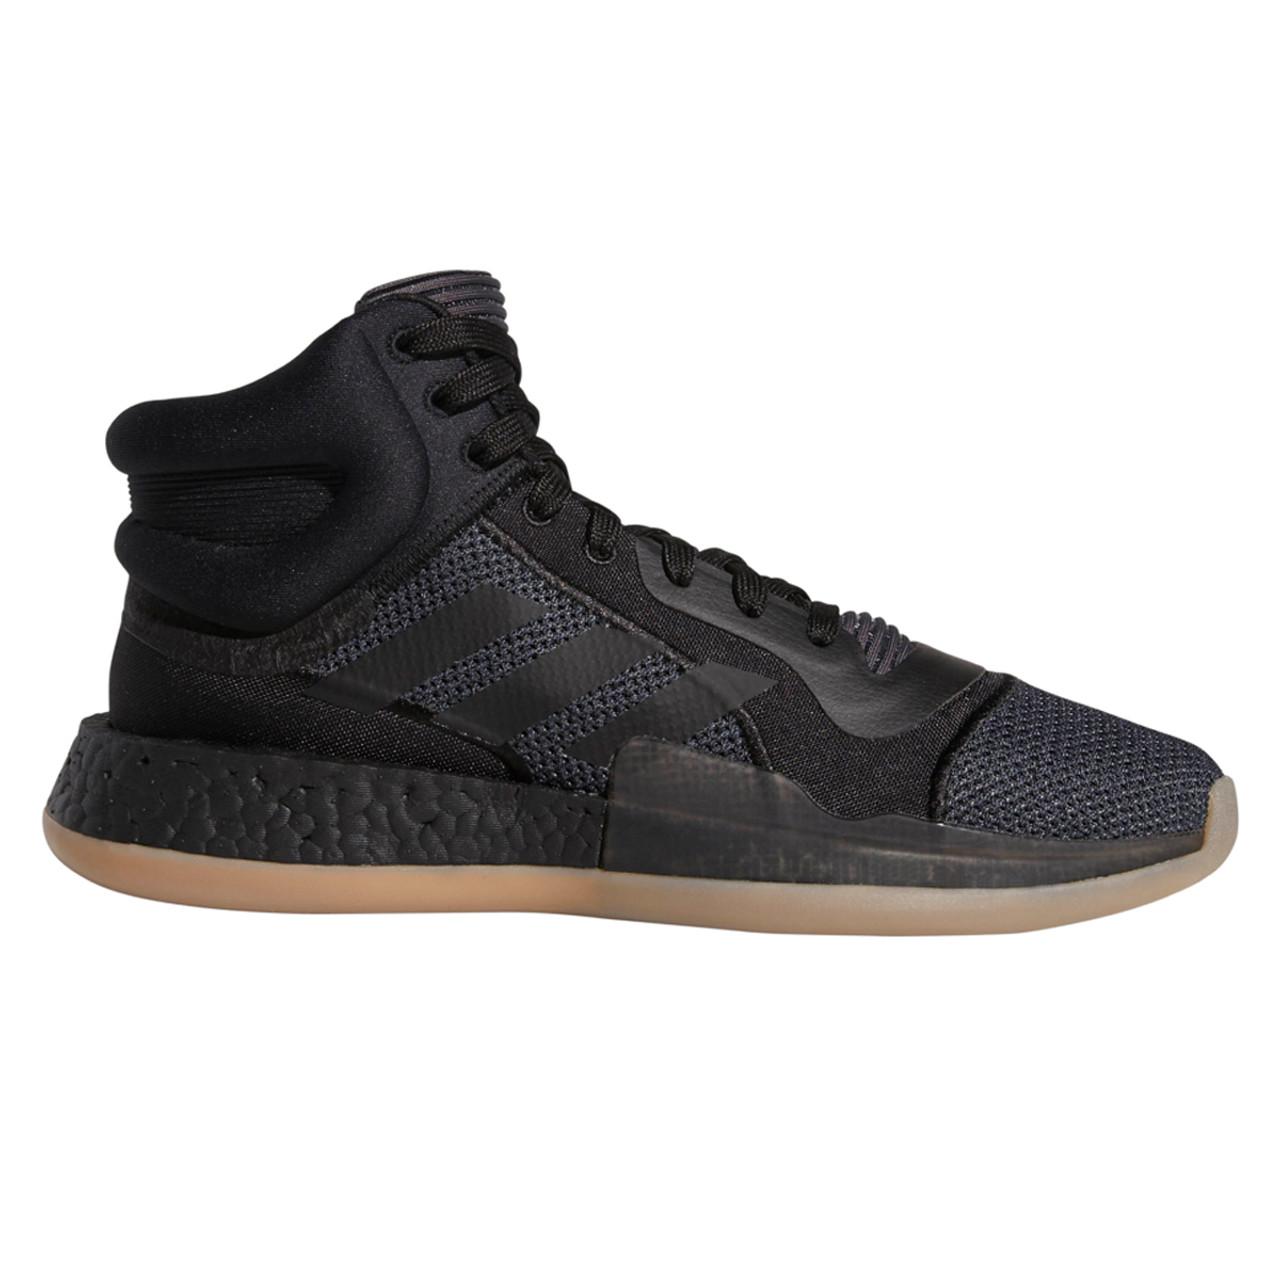 0e5e65fb13751 Adidas Marquee Boost Men s Basketball Sneakers BB9300 - Gray